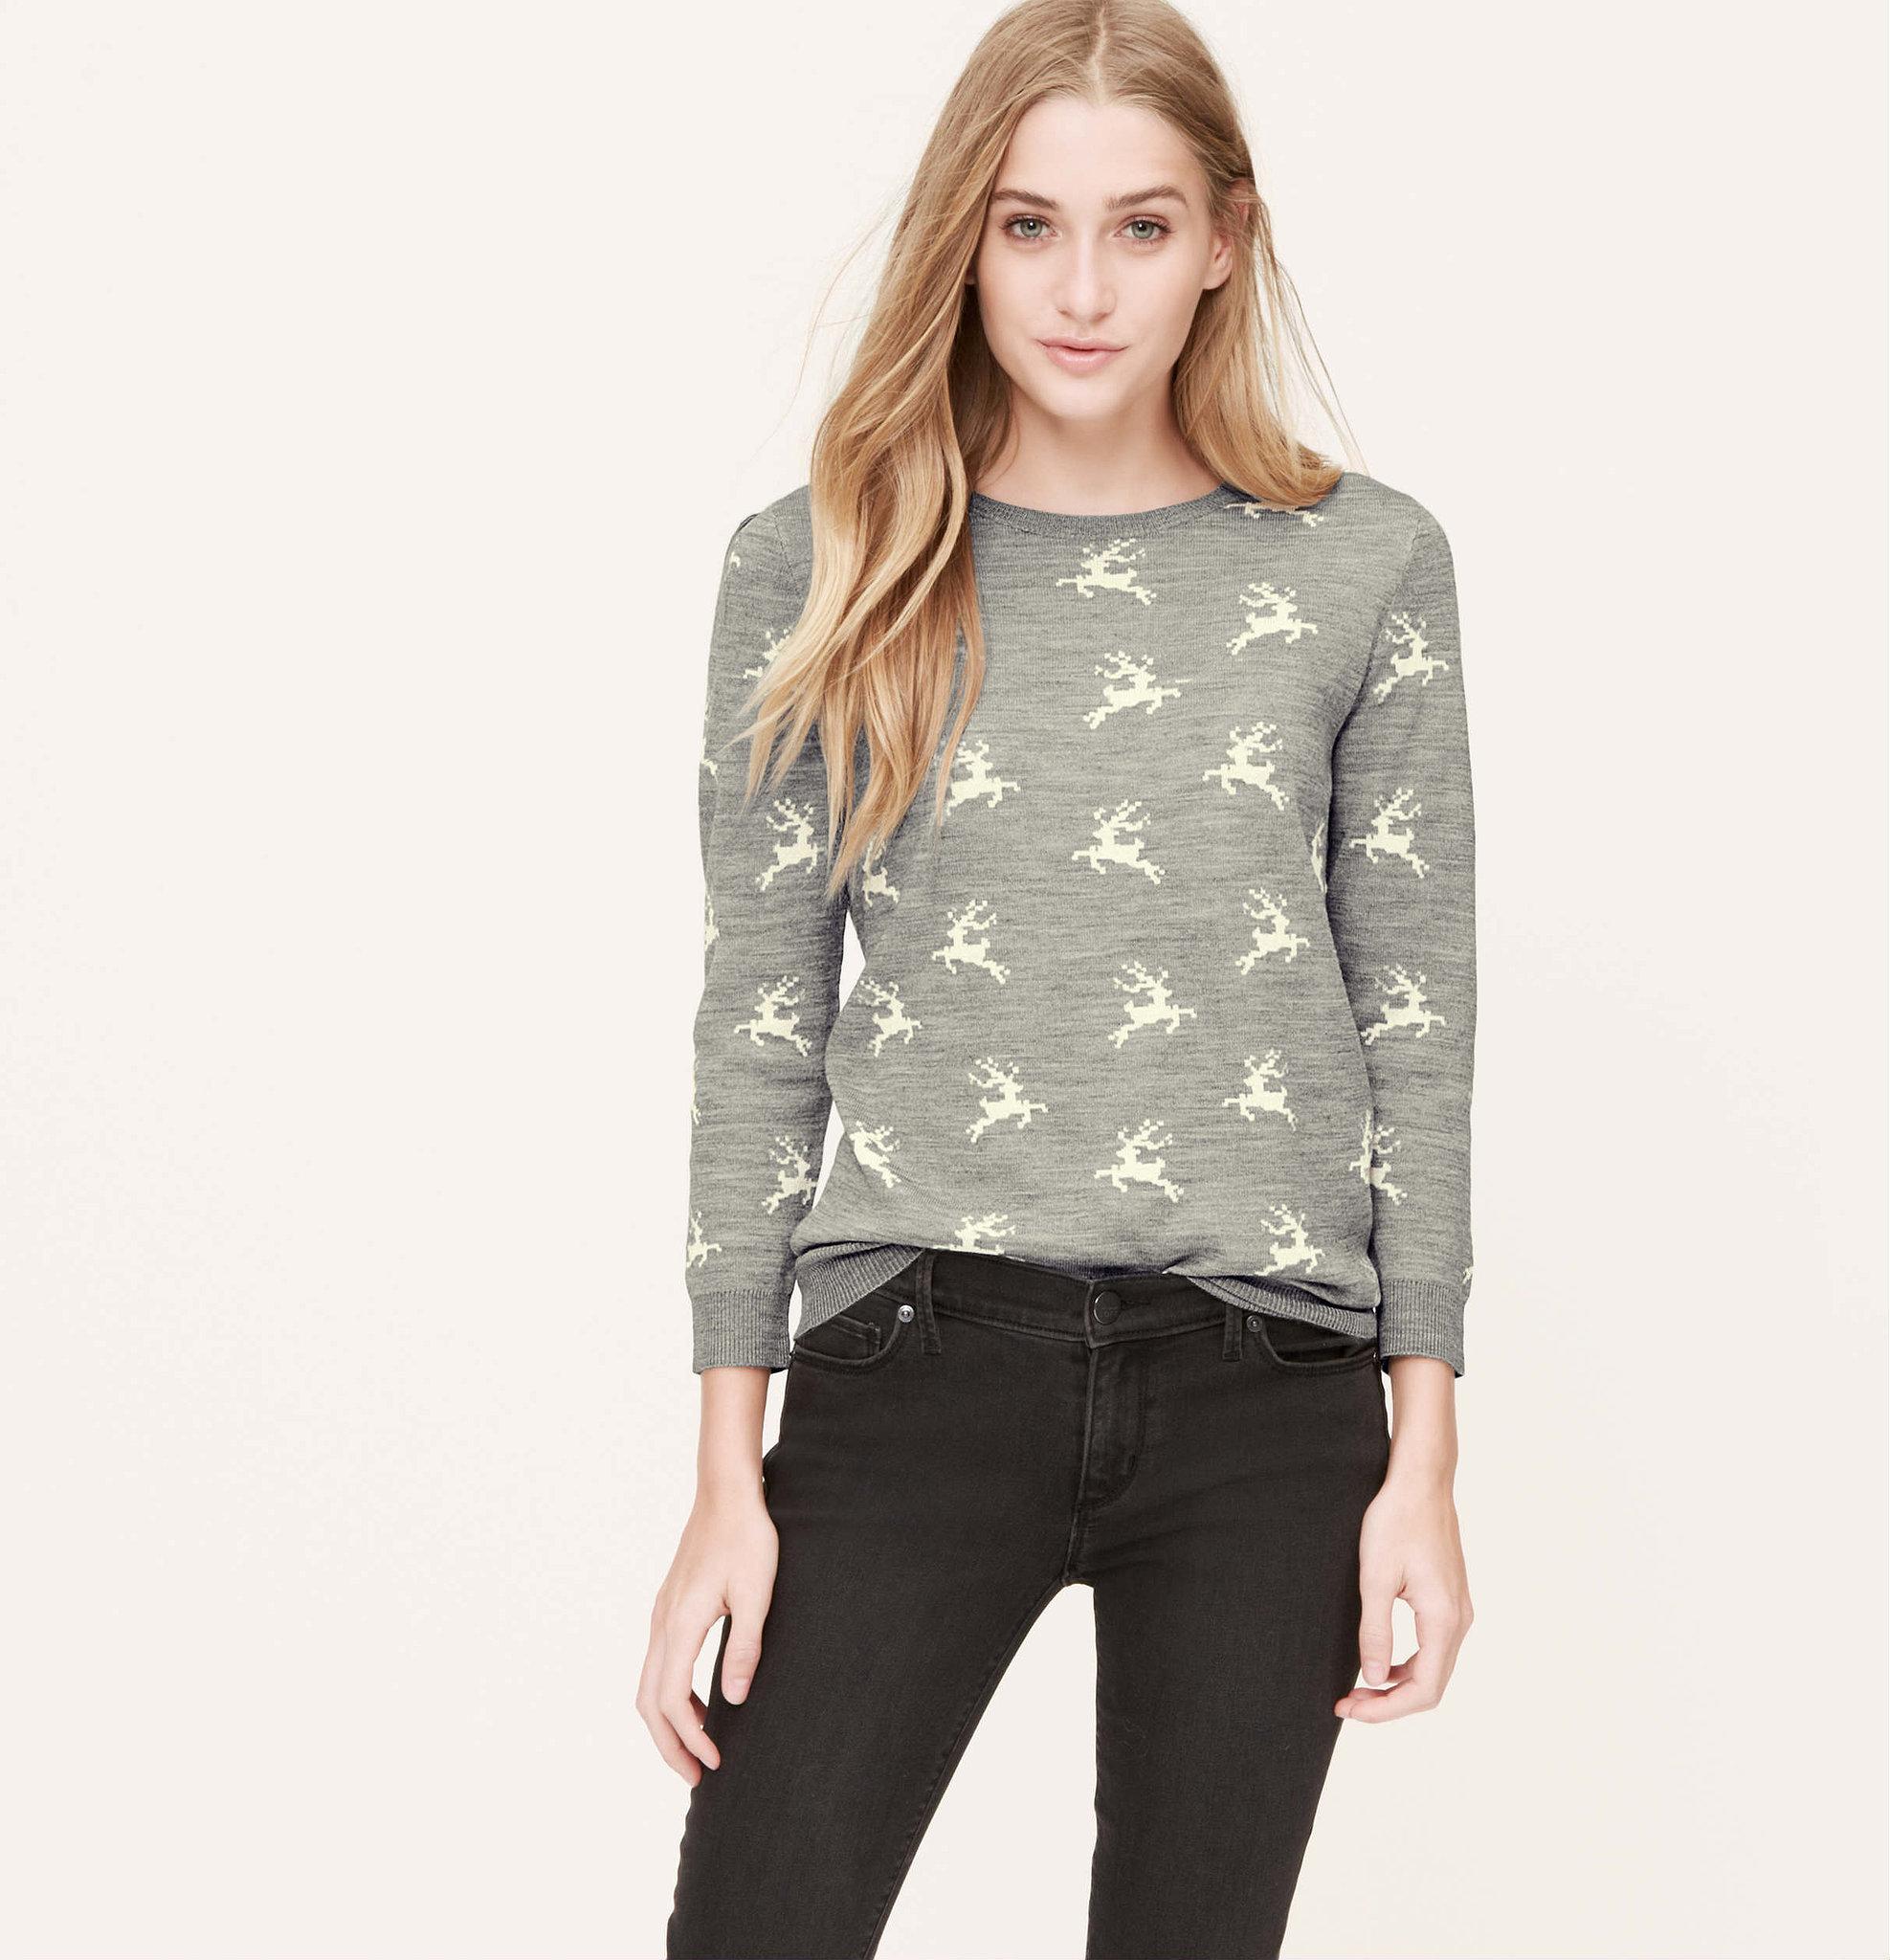 Ugly Christmas Sweaters | POPSUGAR Fashion